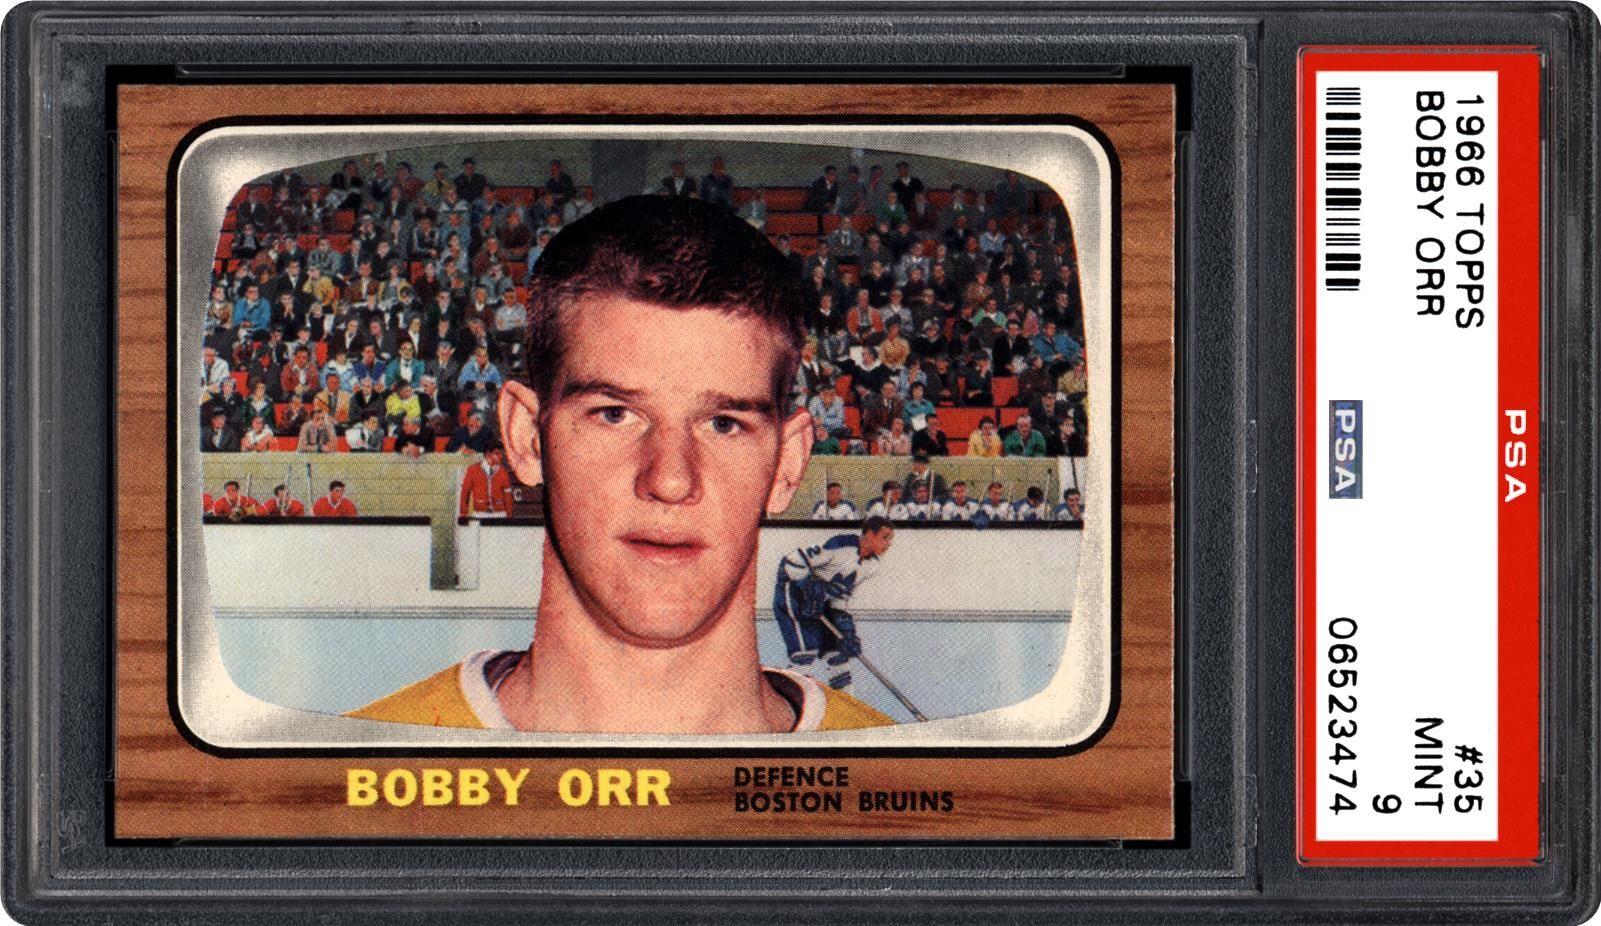 1966 Topps Bobby Orr Psa Cardfacts